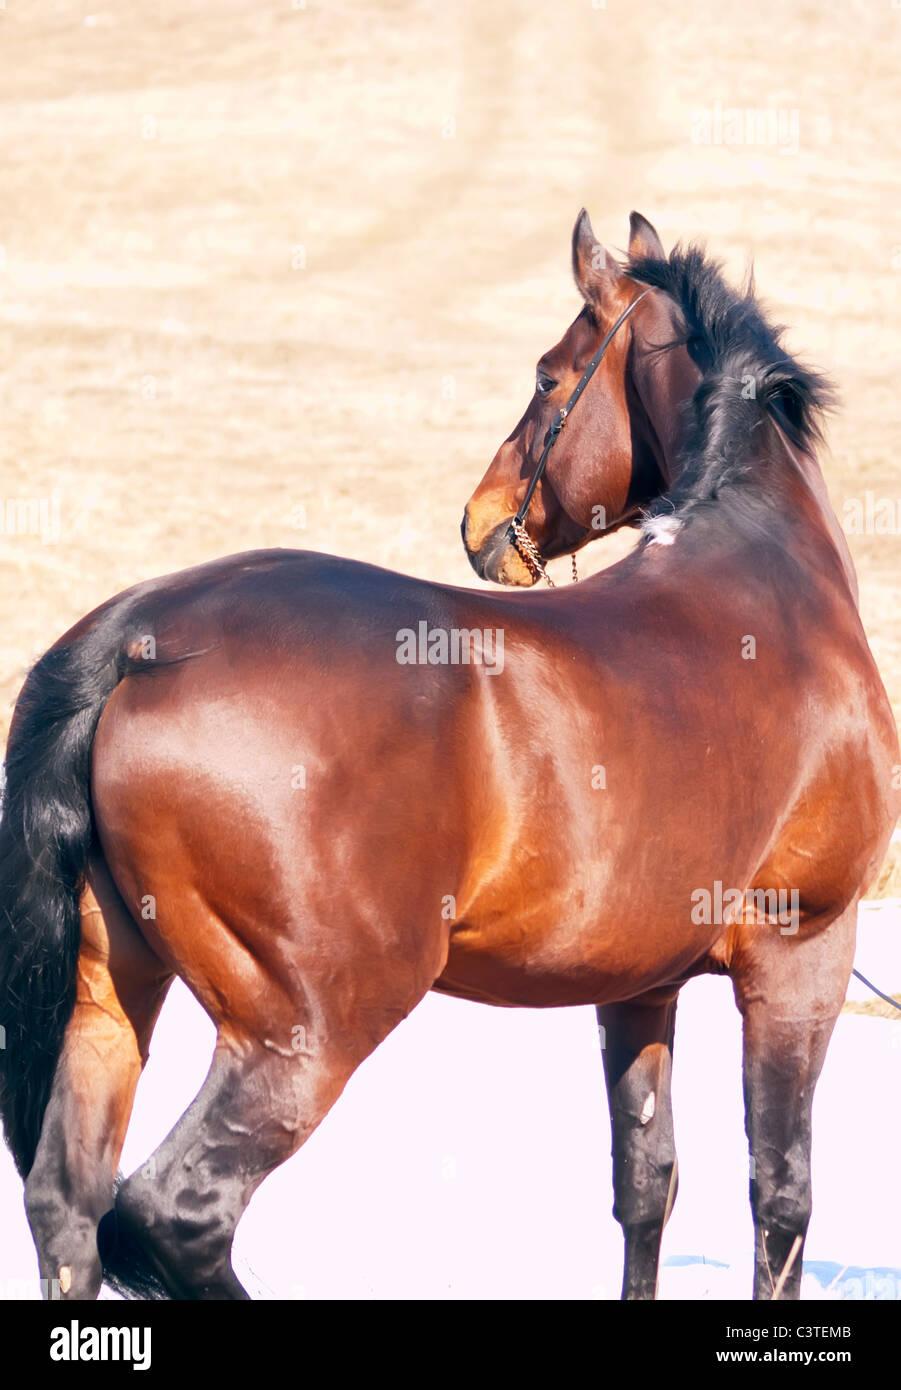 bay  horse   in spring field - Stock Image